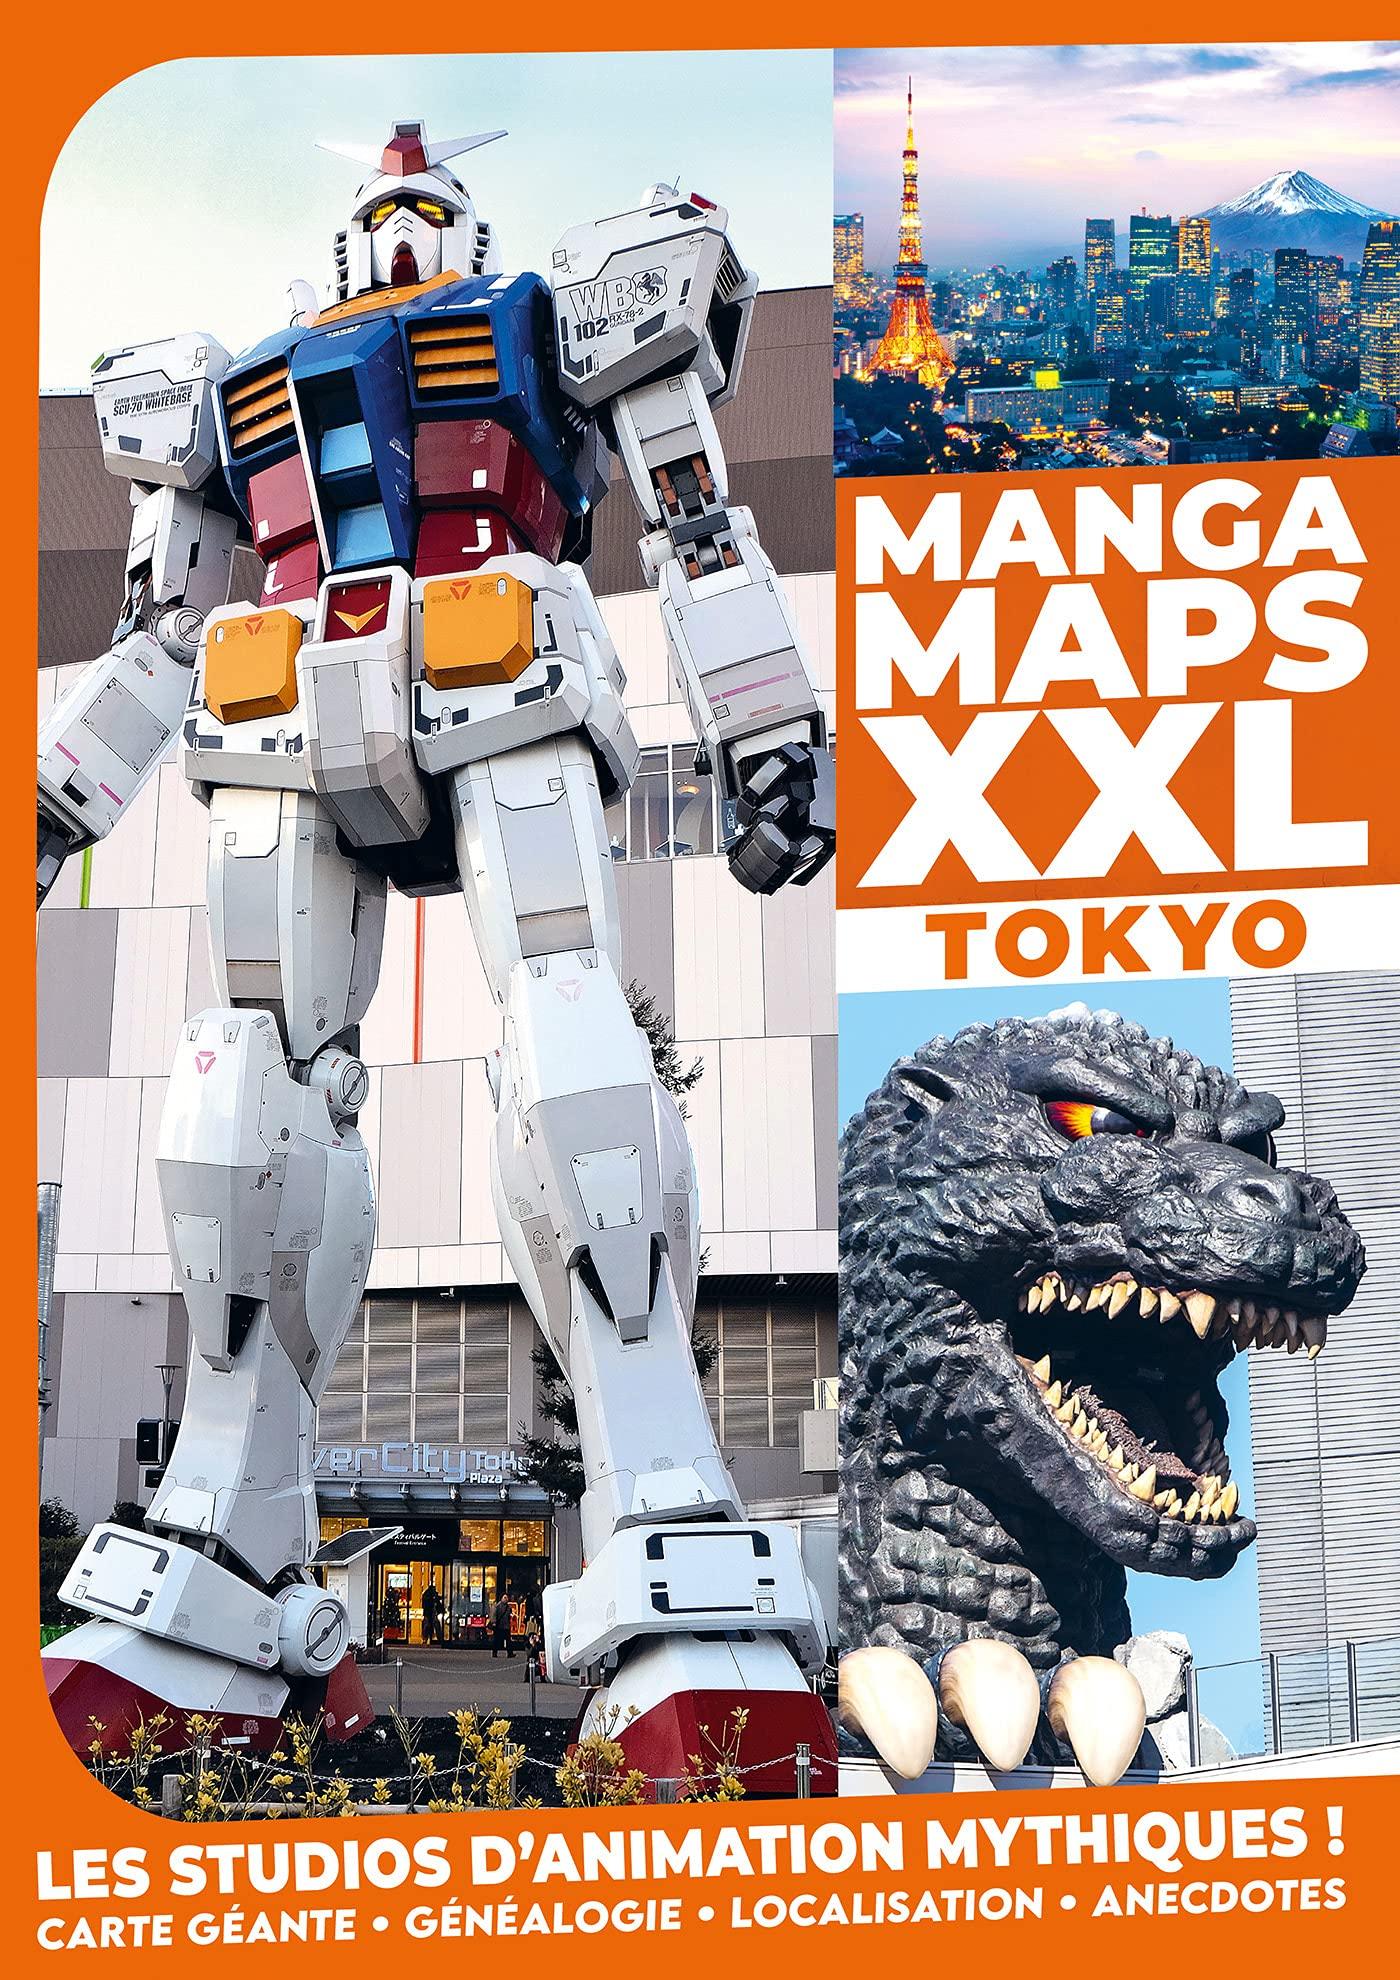 Animeland 5 - Manga Maps XXL Tokyo